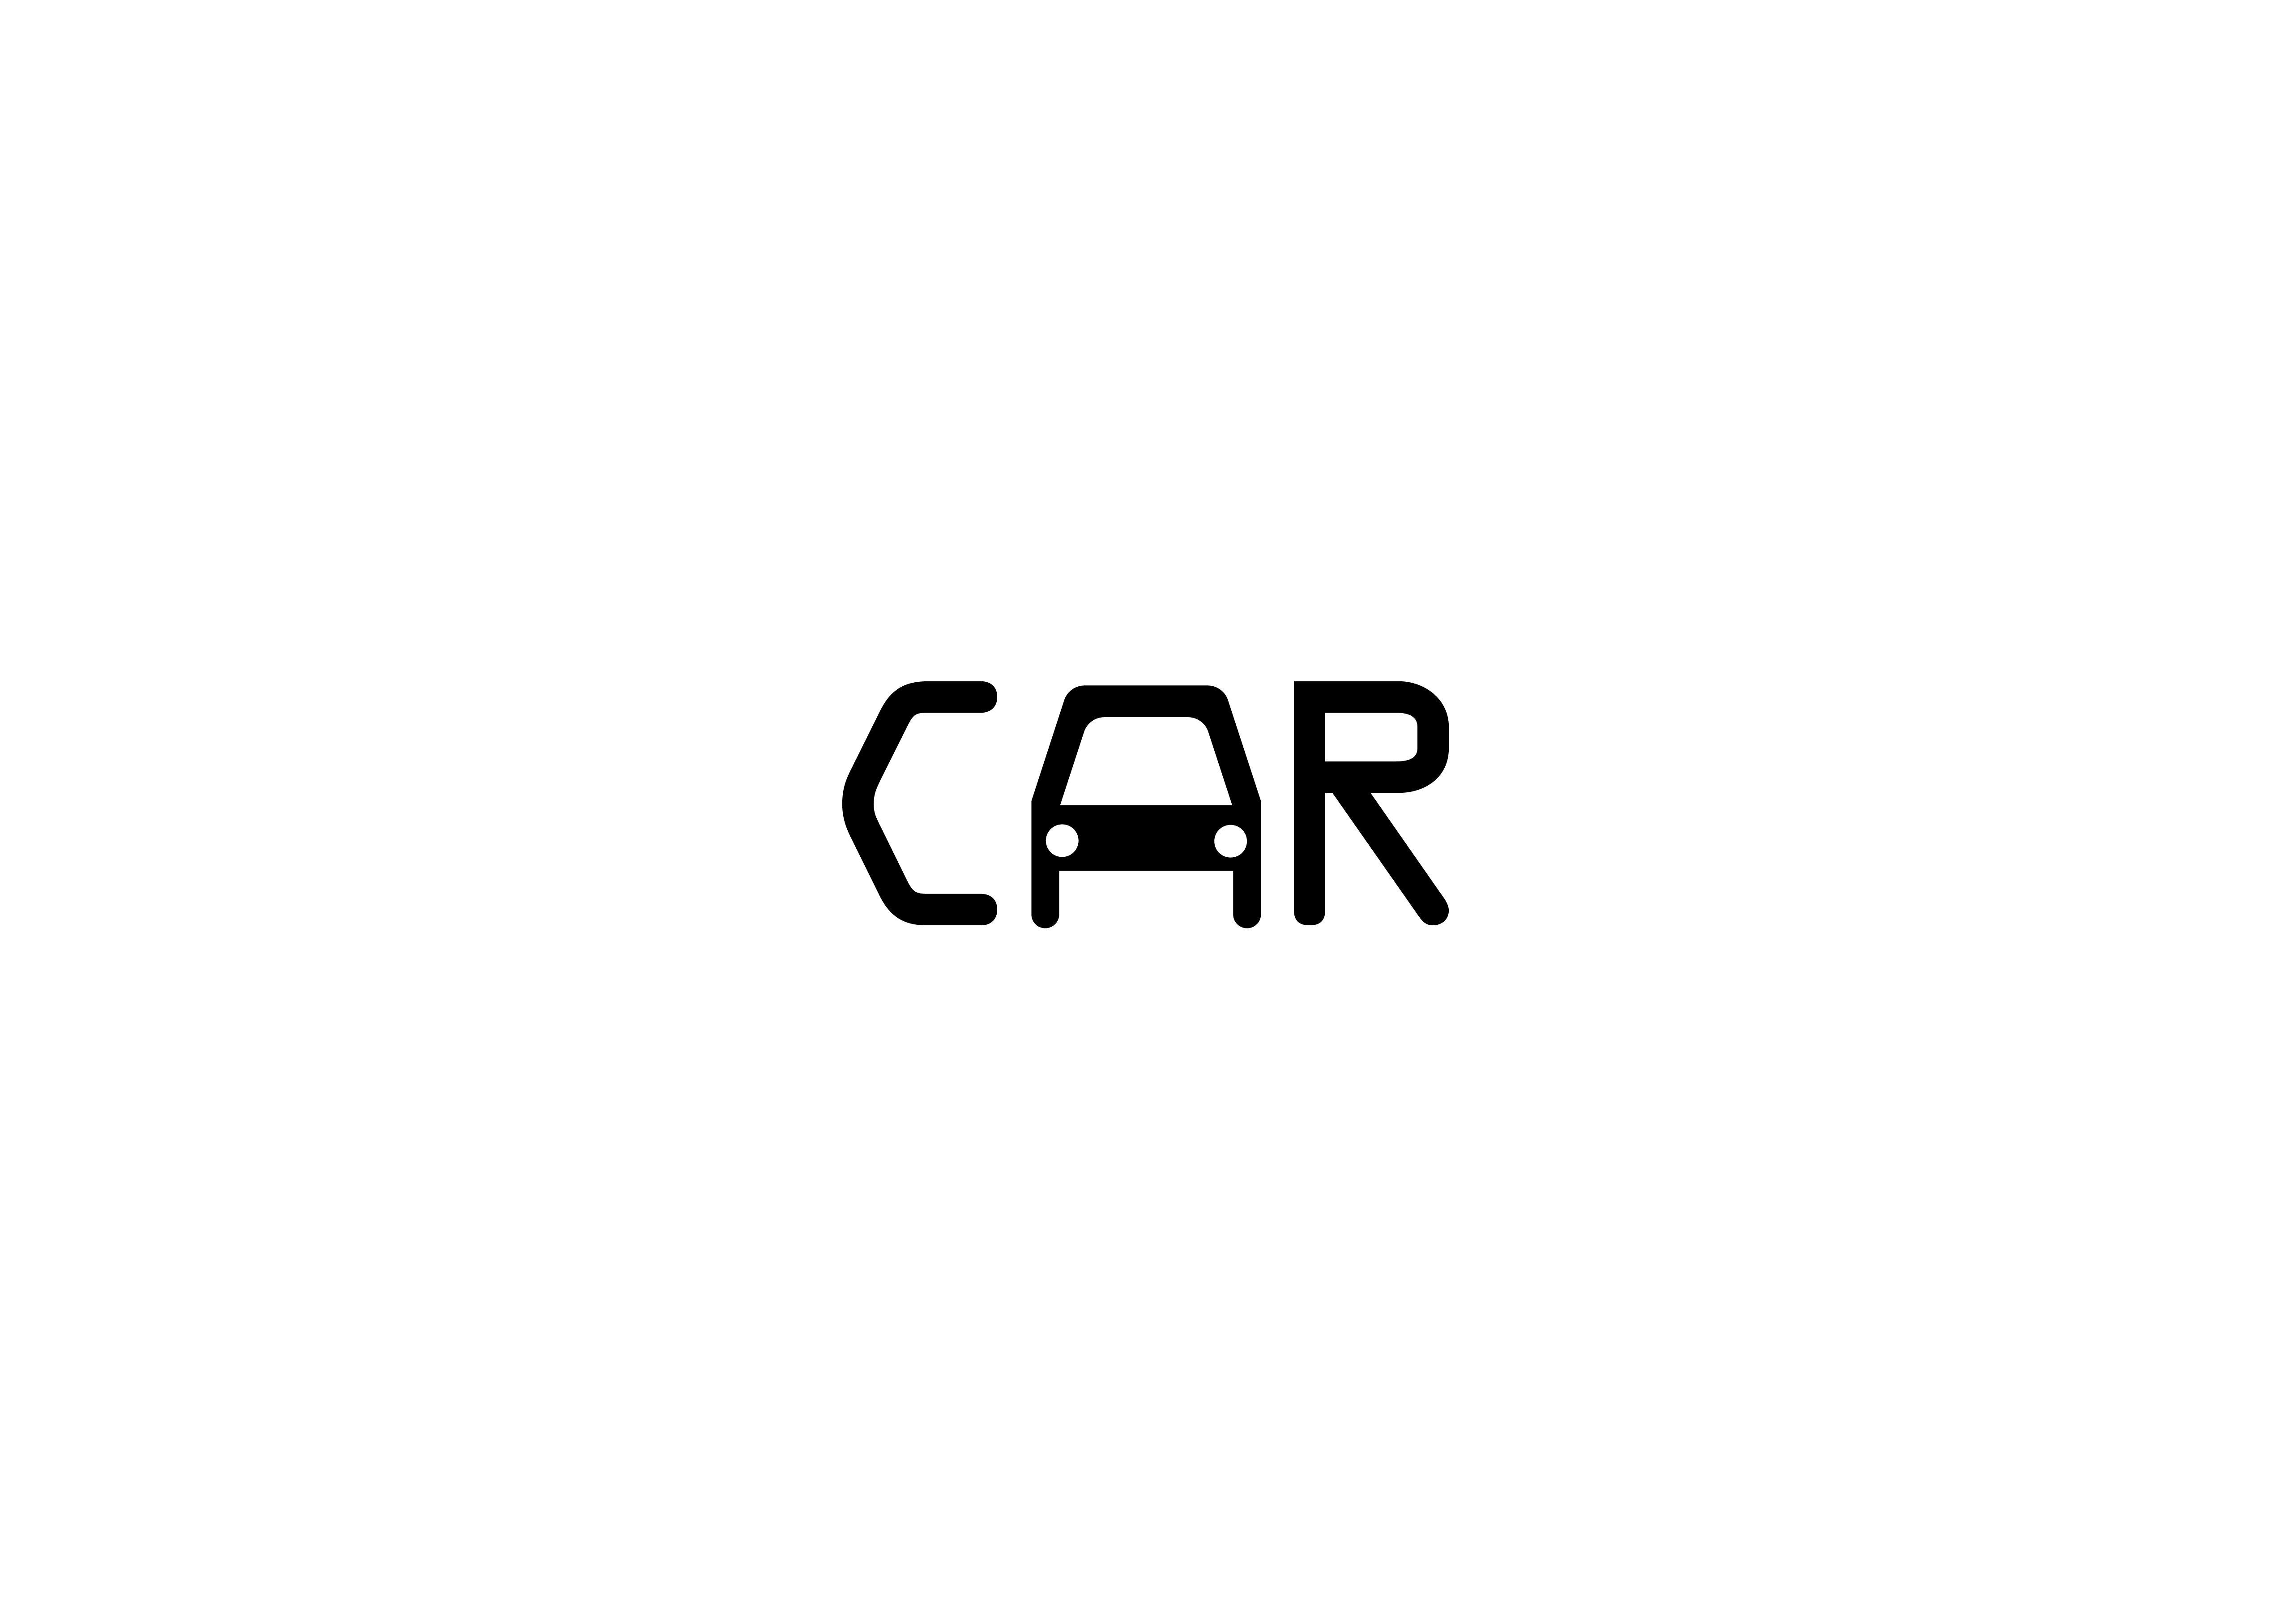 Car Wordplay Typographic logo design, Car logo design